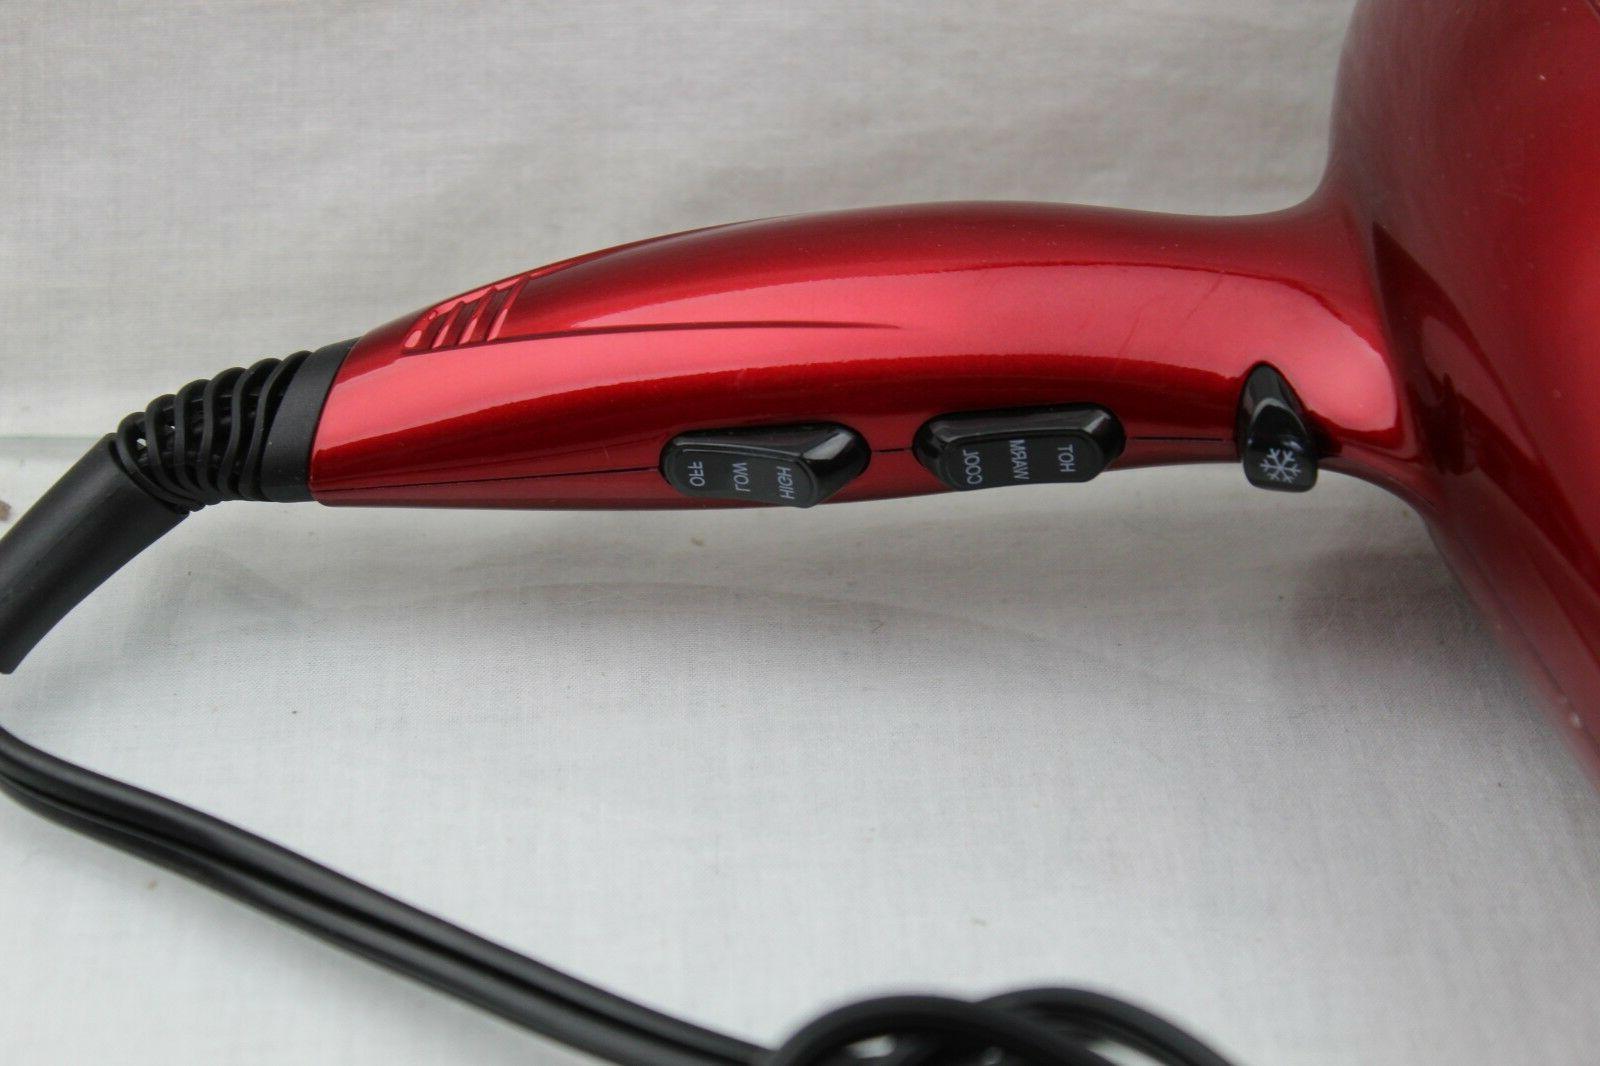 Jinri Hair Dryer 1875W Lightweight DC Ionic Blow